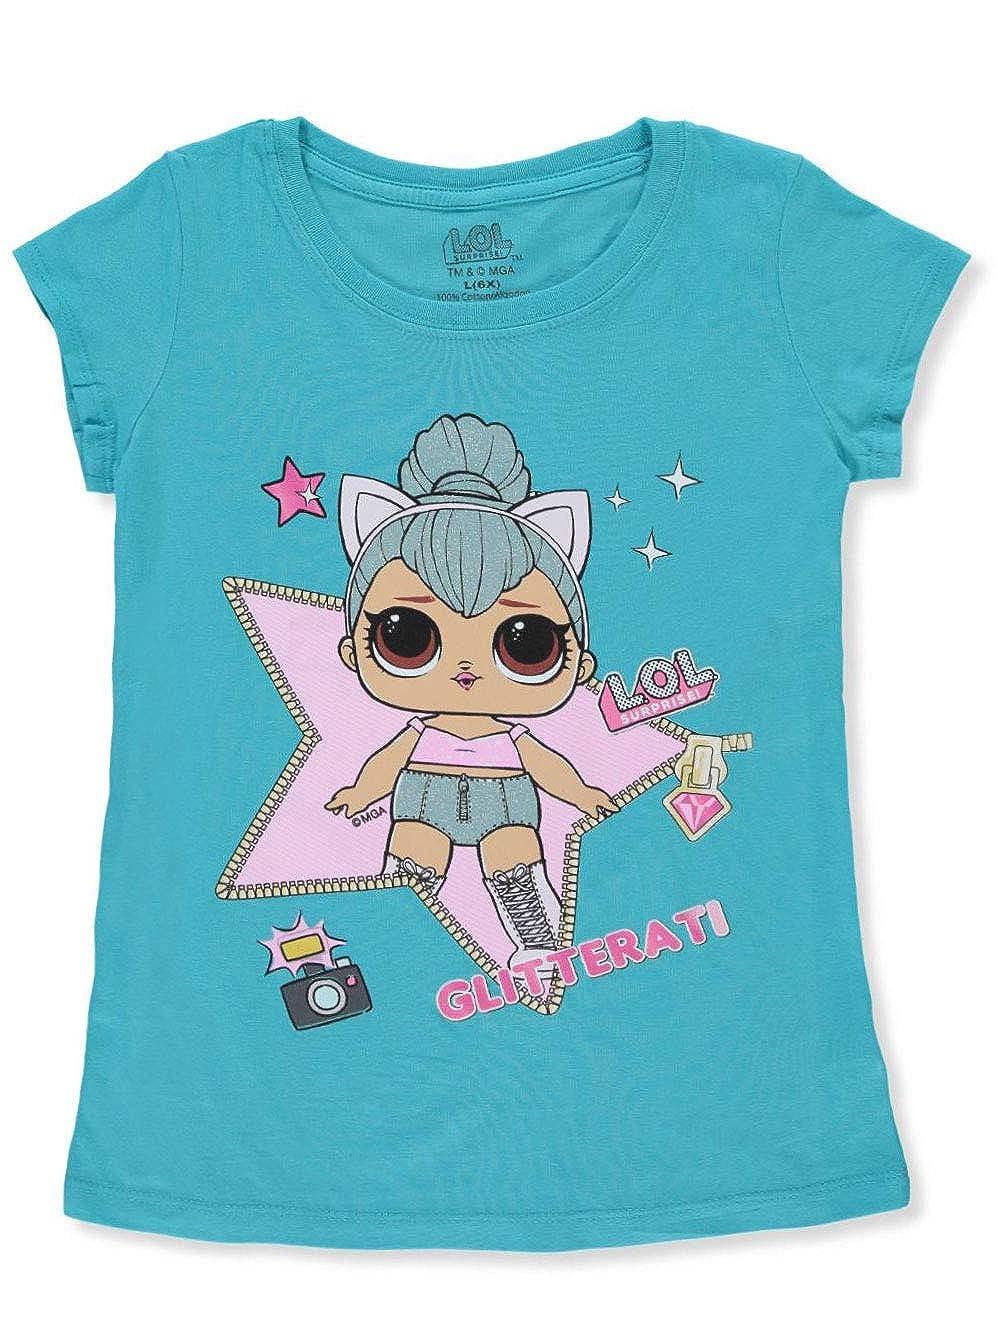 LOL Surprise Girls' T-Shirt